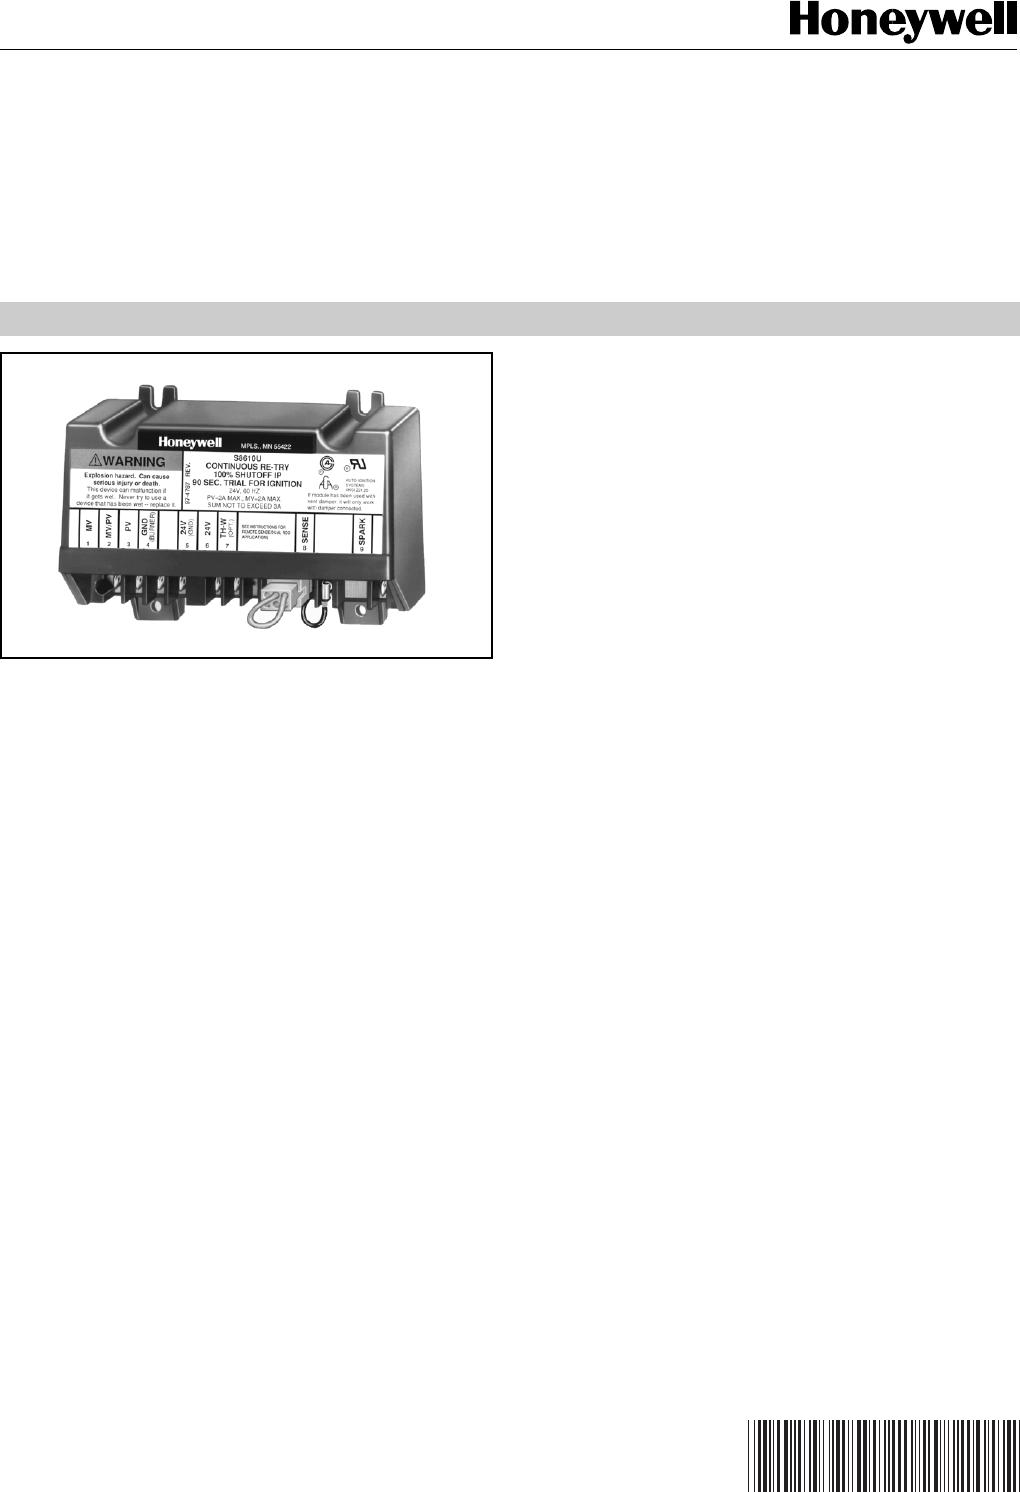 S8610u1003 Wiring Diagram